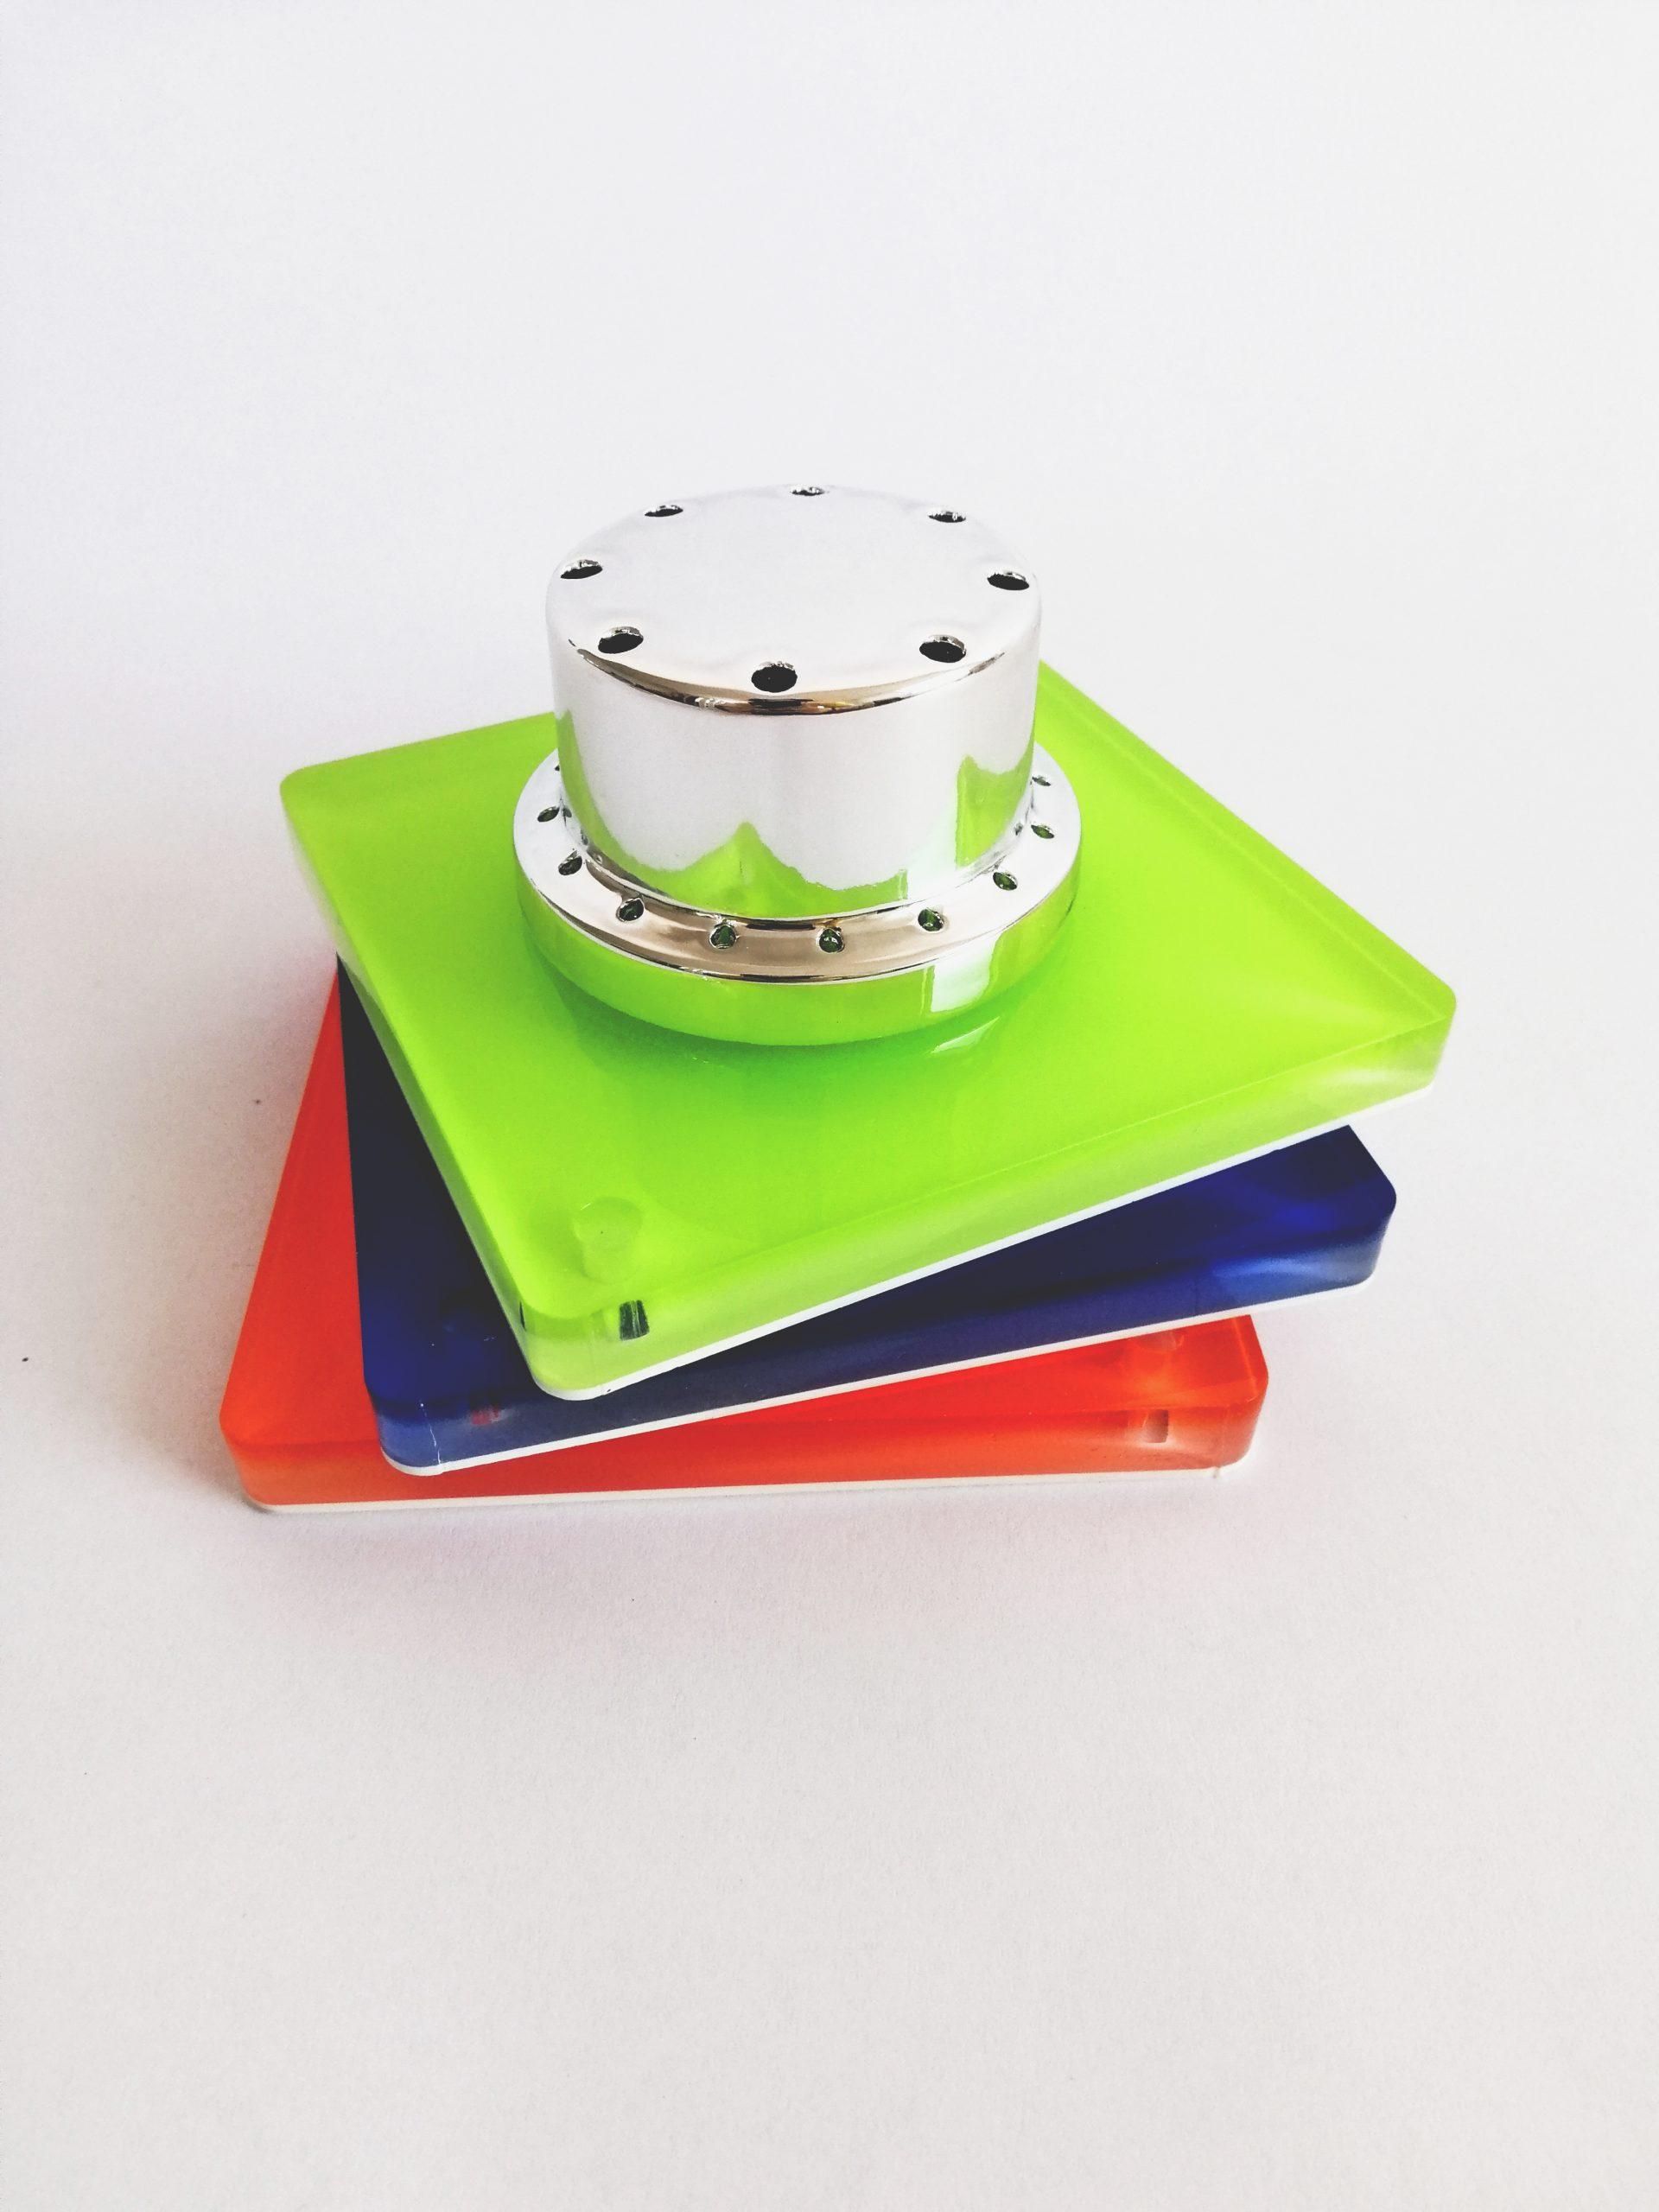 Arredo Bagno Metallizzazione Stampa 3D - KreaItaly, Stampa 3d - Stampanti 3d Marche - Stampanti 3D prezzi - Aziende stampa 3d